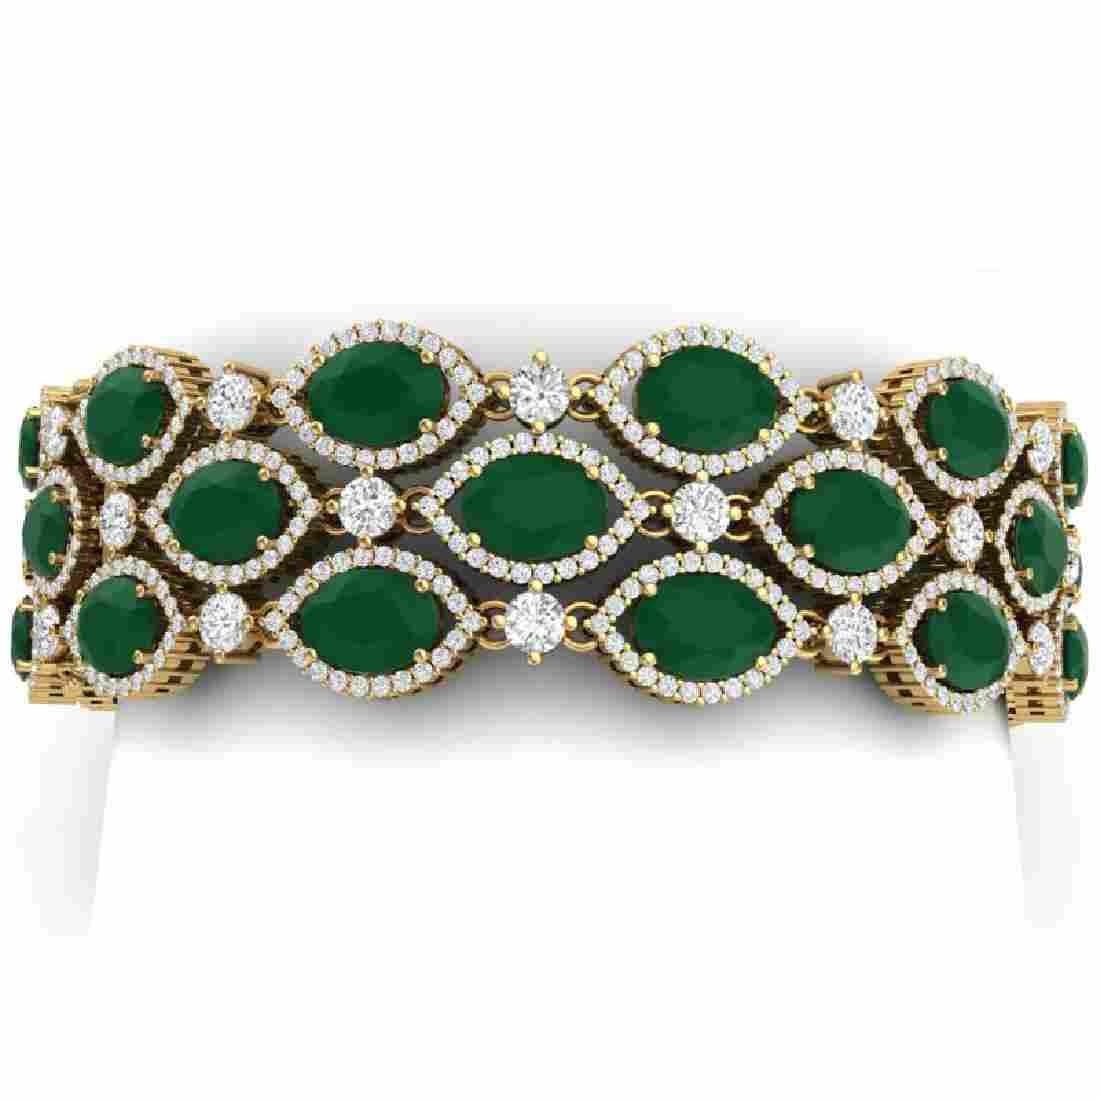 52.84 CTW Royalty Emerald & VS Diamond Bracelet 18K